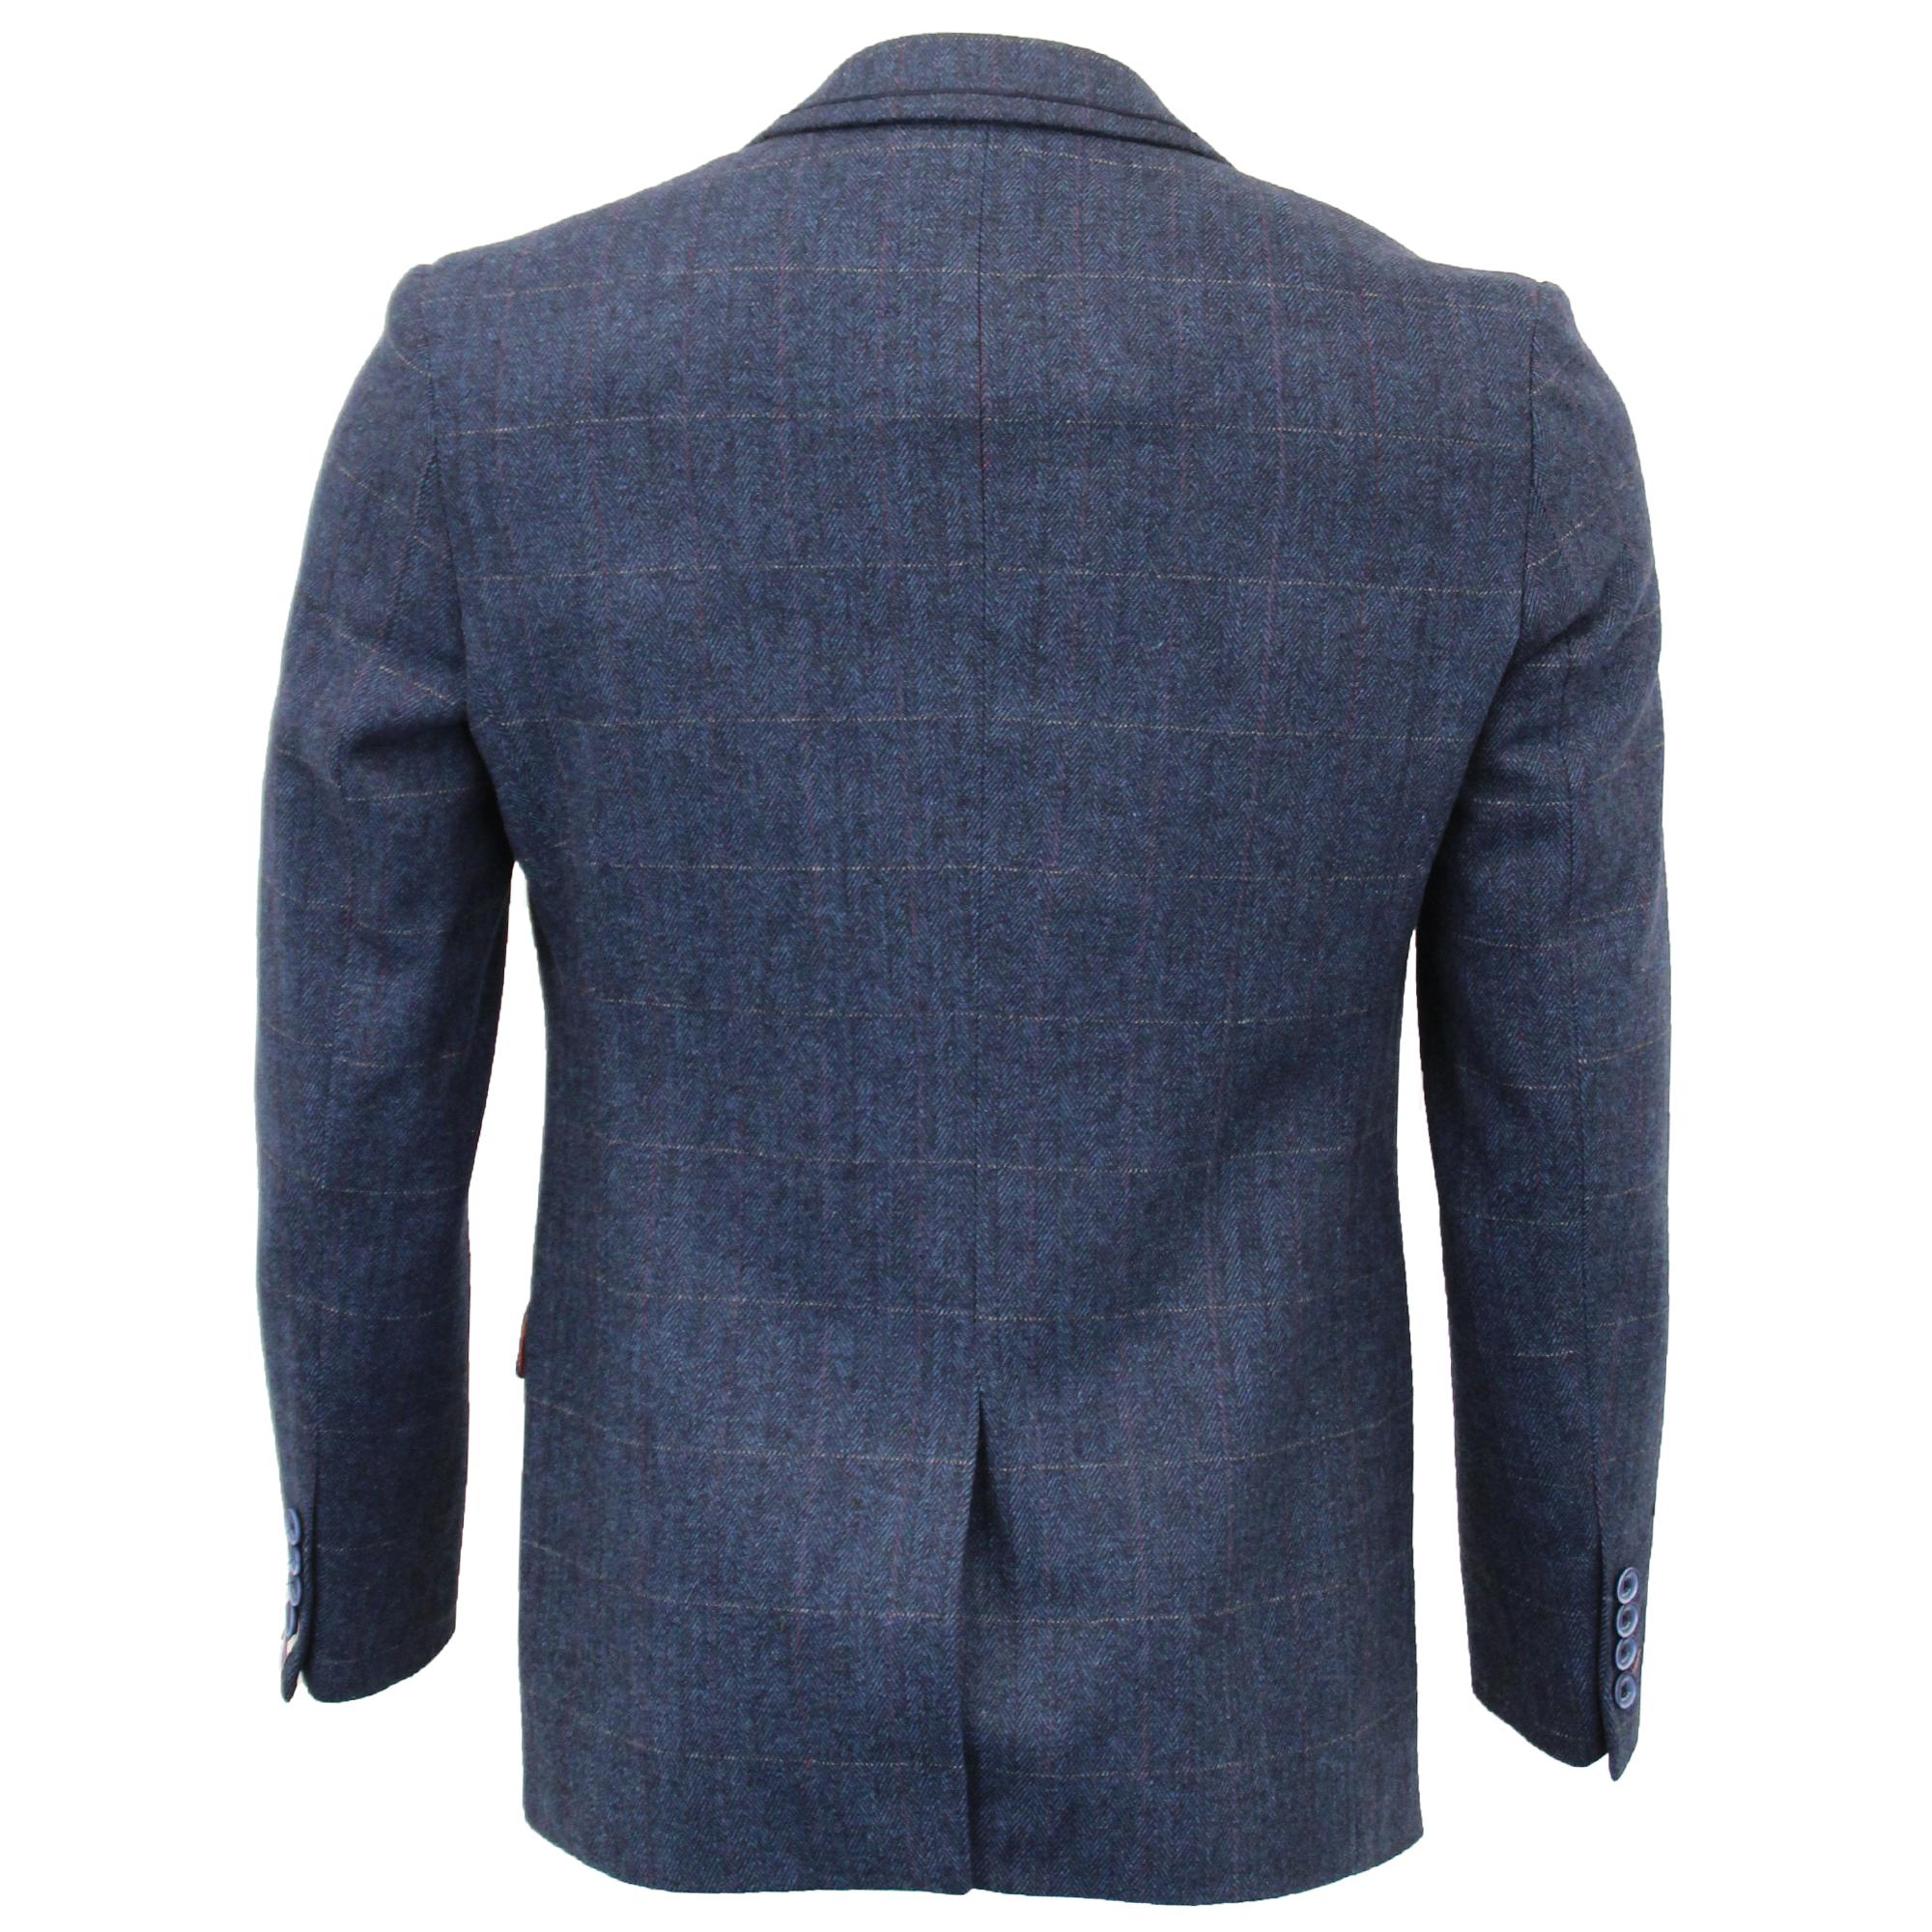 Mens-Wool-Mix-3-Piece-Tweed-Suit-Cavani-CARNEGI-Checked-Peaky-Blinders-Party-New thumbnail 3